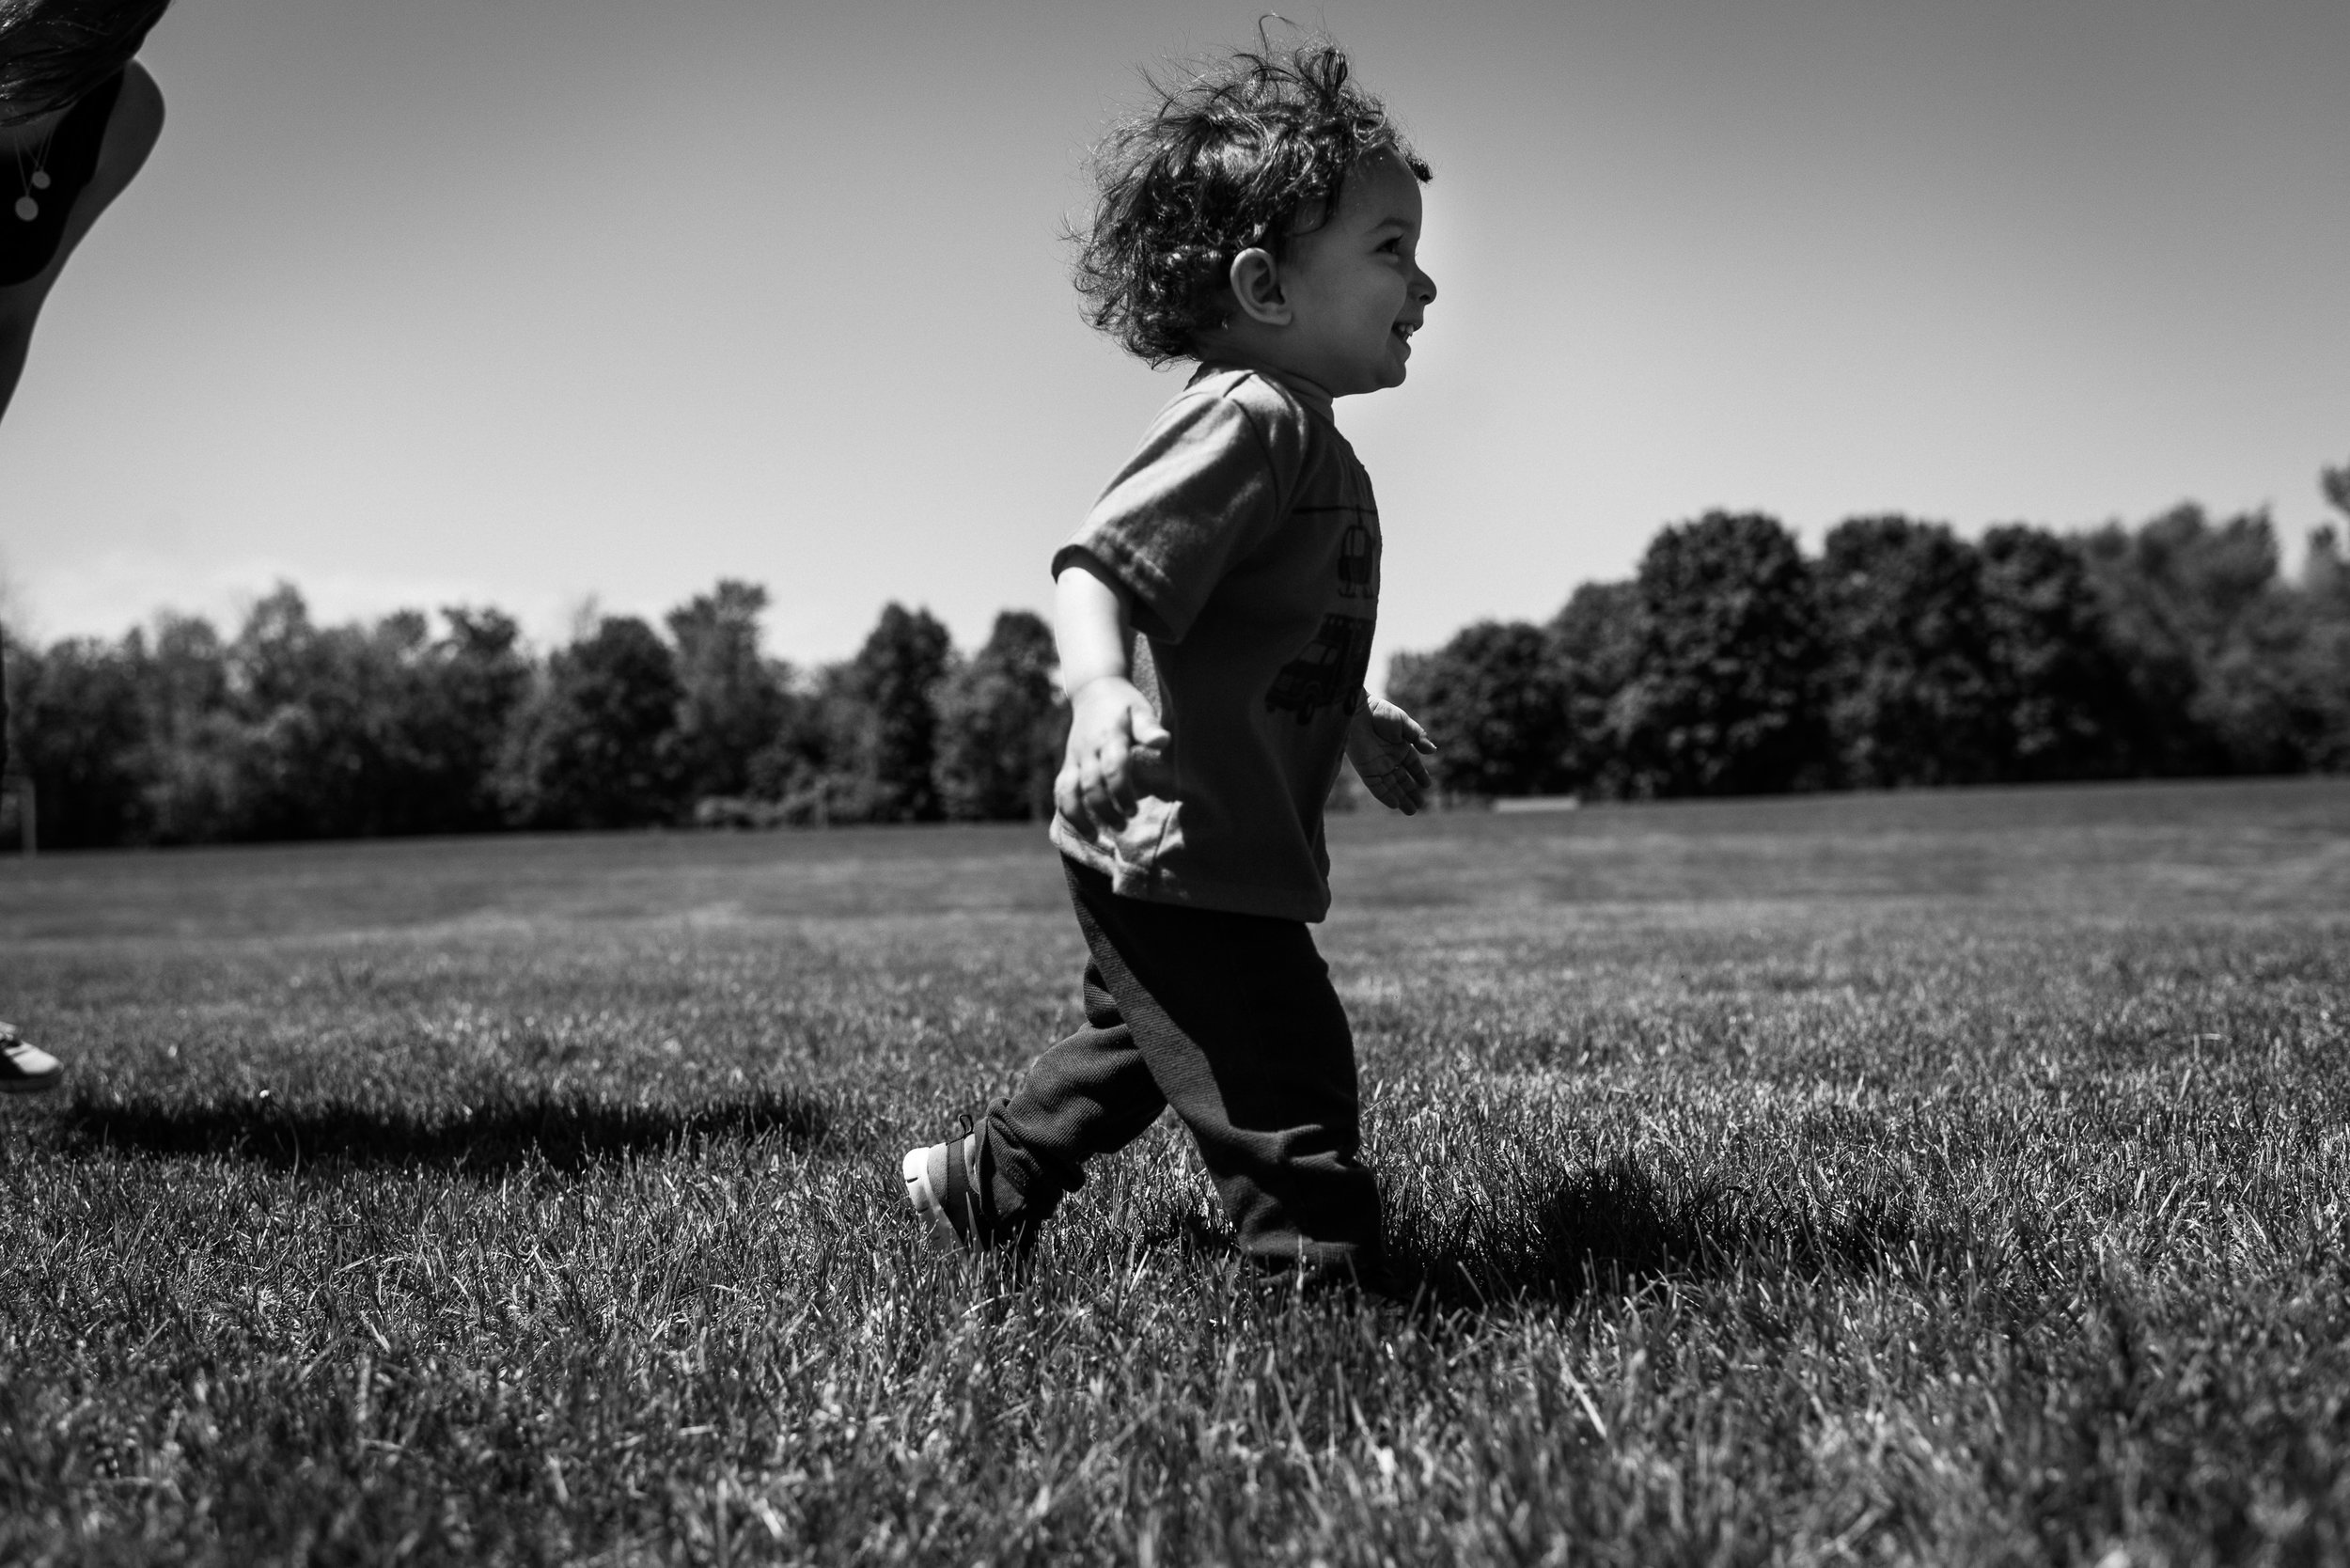 family documentary photography brampton -141713vm.jpg